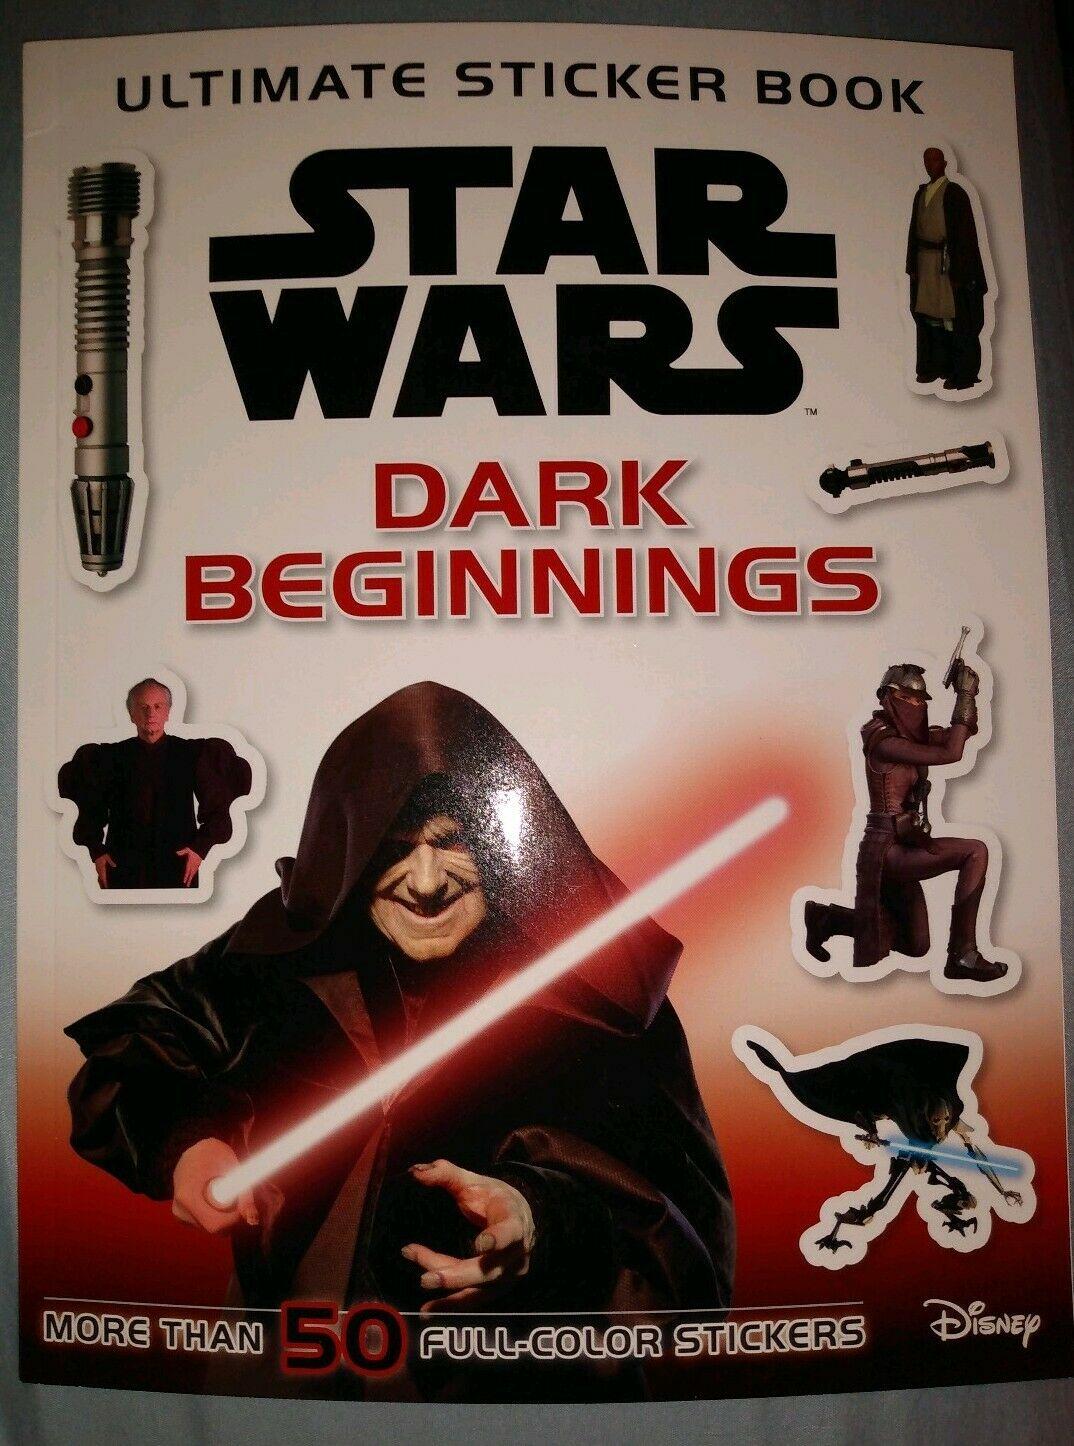 Star Wars Ultimate Sticker Book: Dark Beginnings